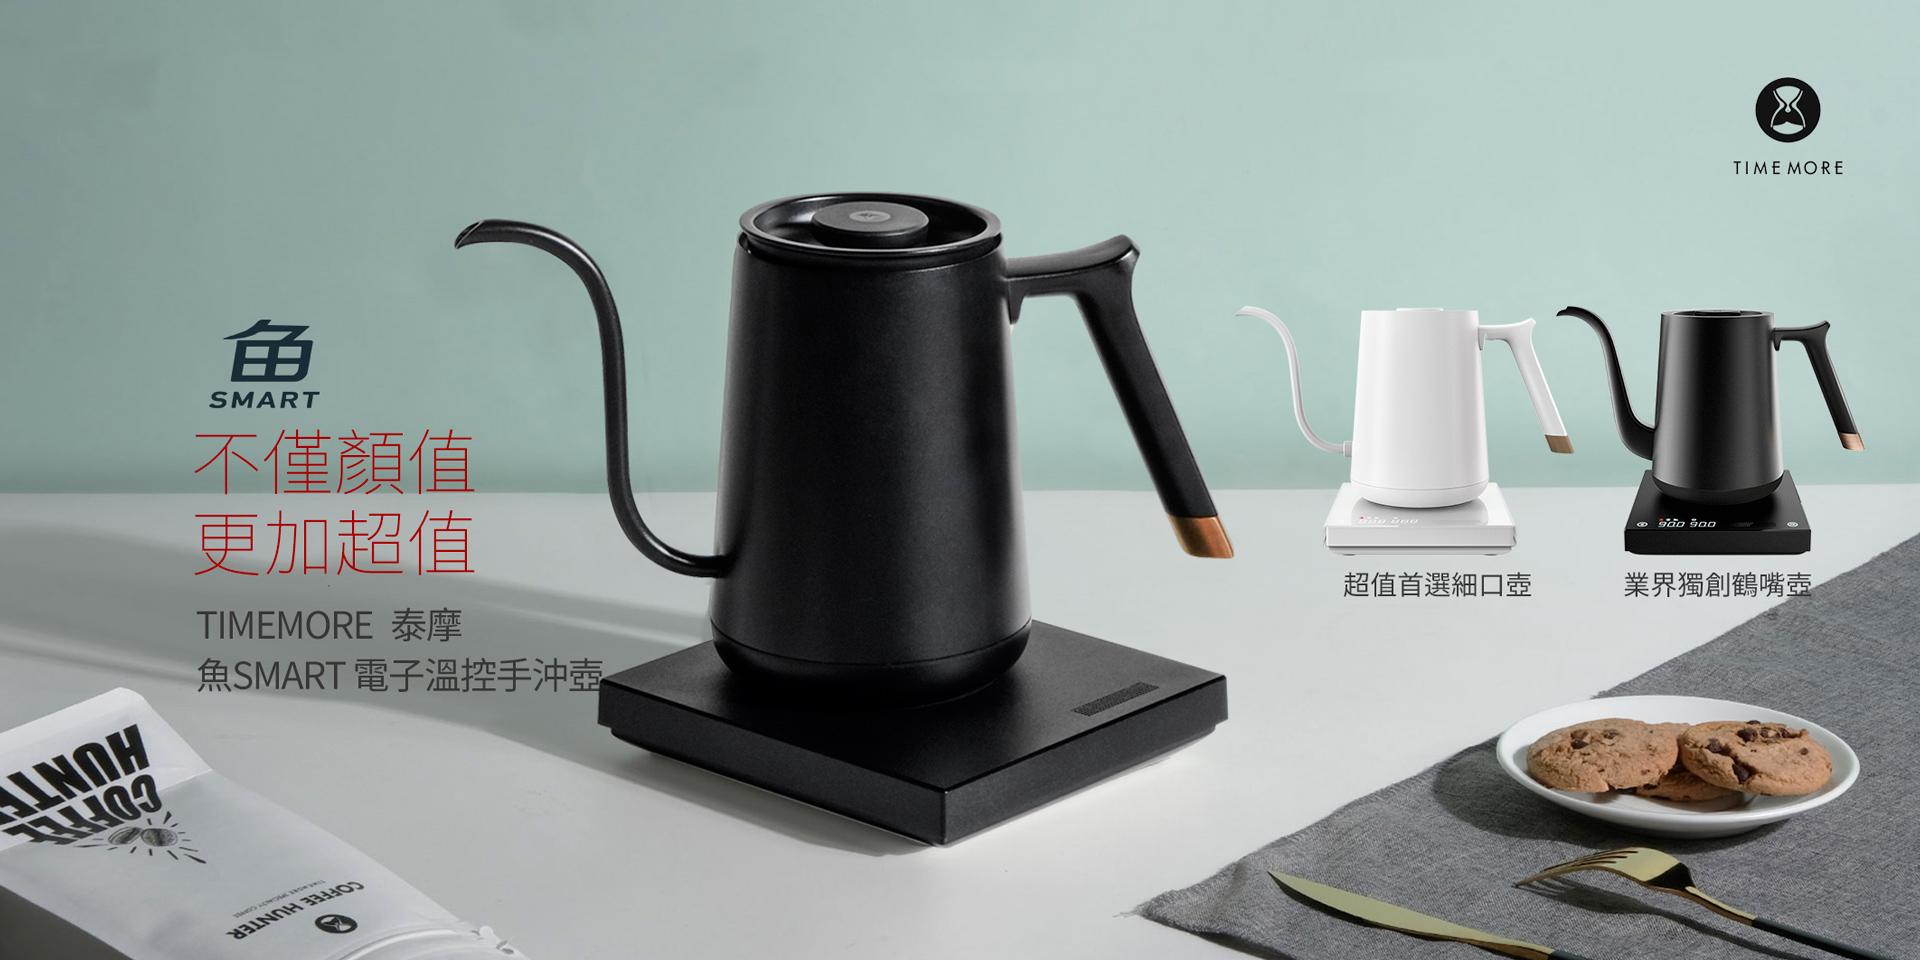 TIMEMORE泰摩魚SMART電子溫控手沖壺